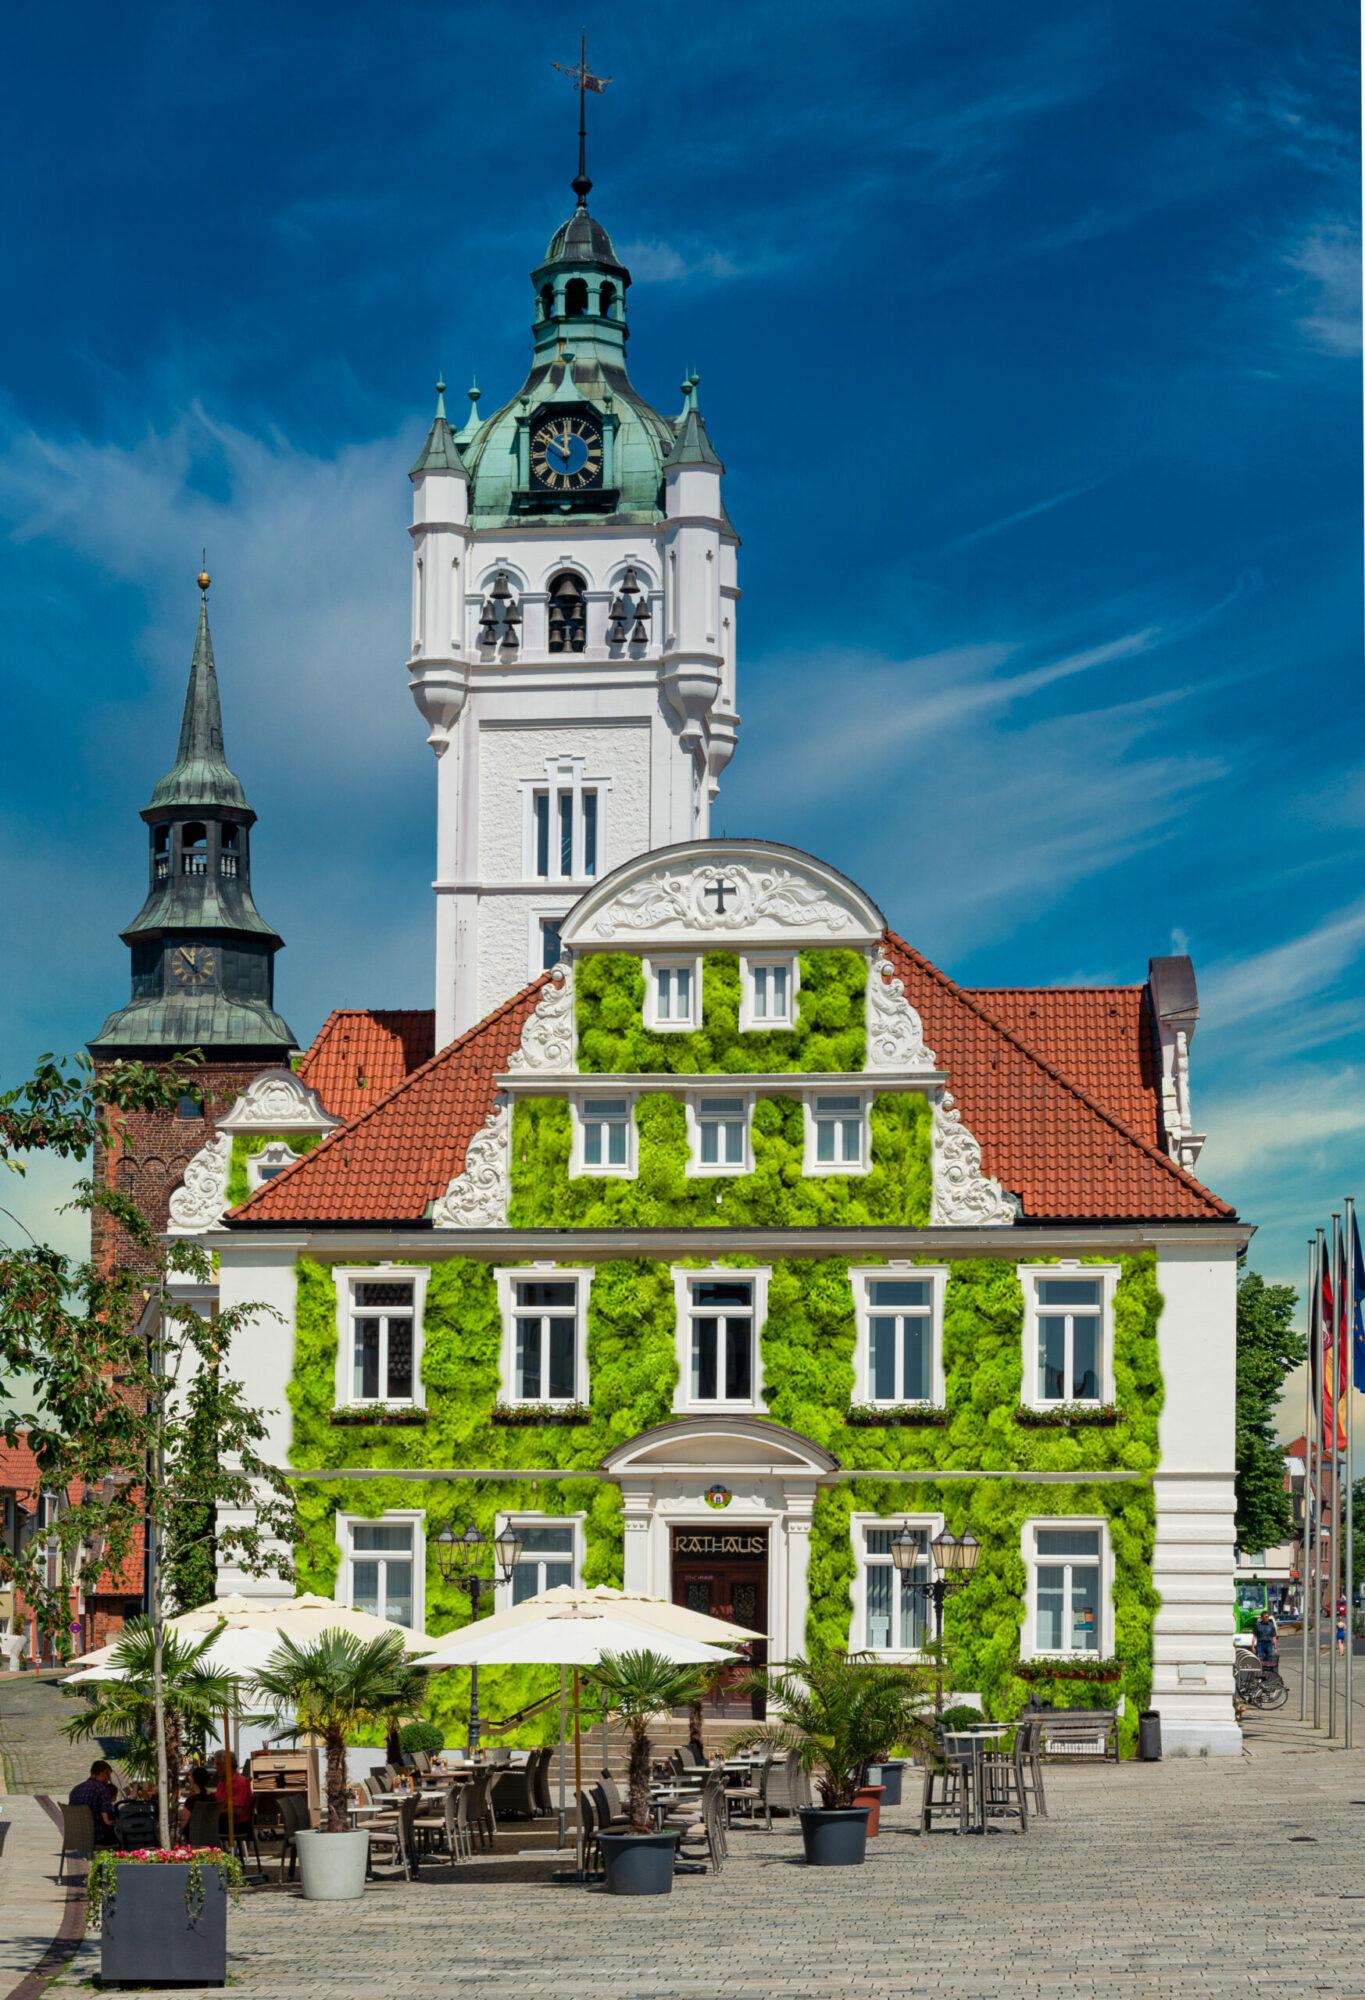 Rathausgrün scaled